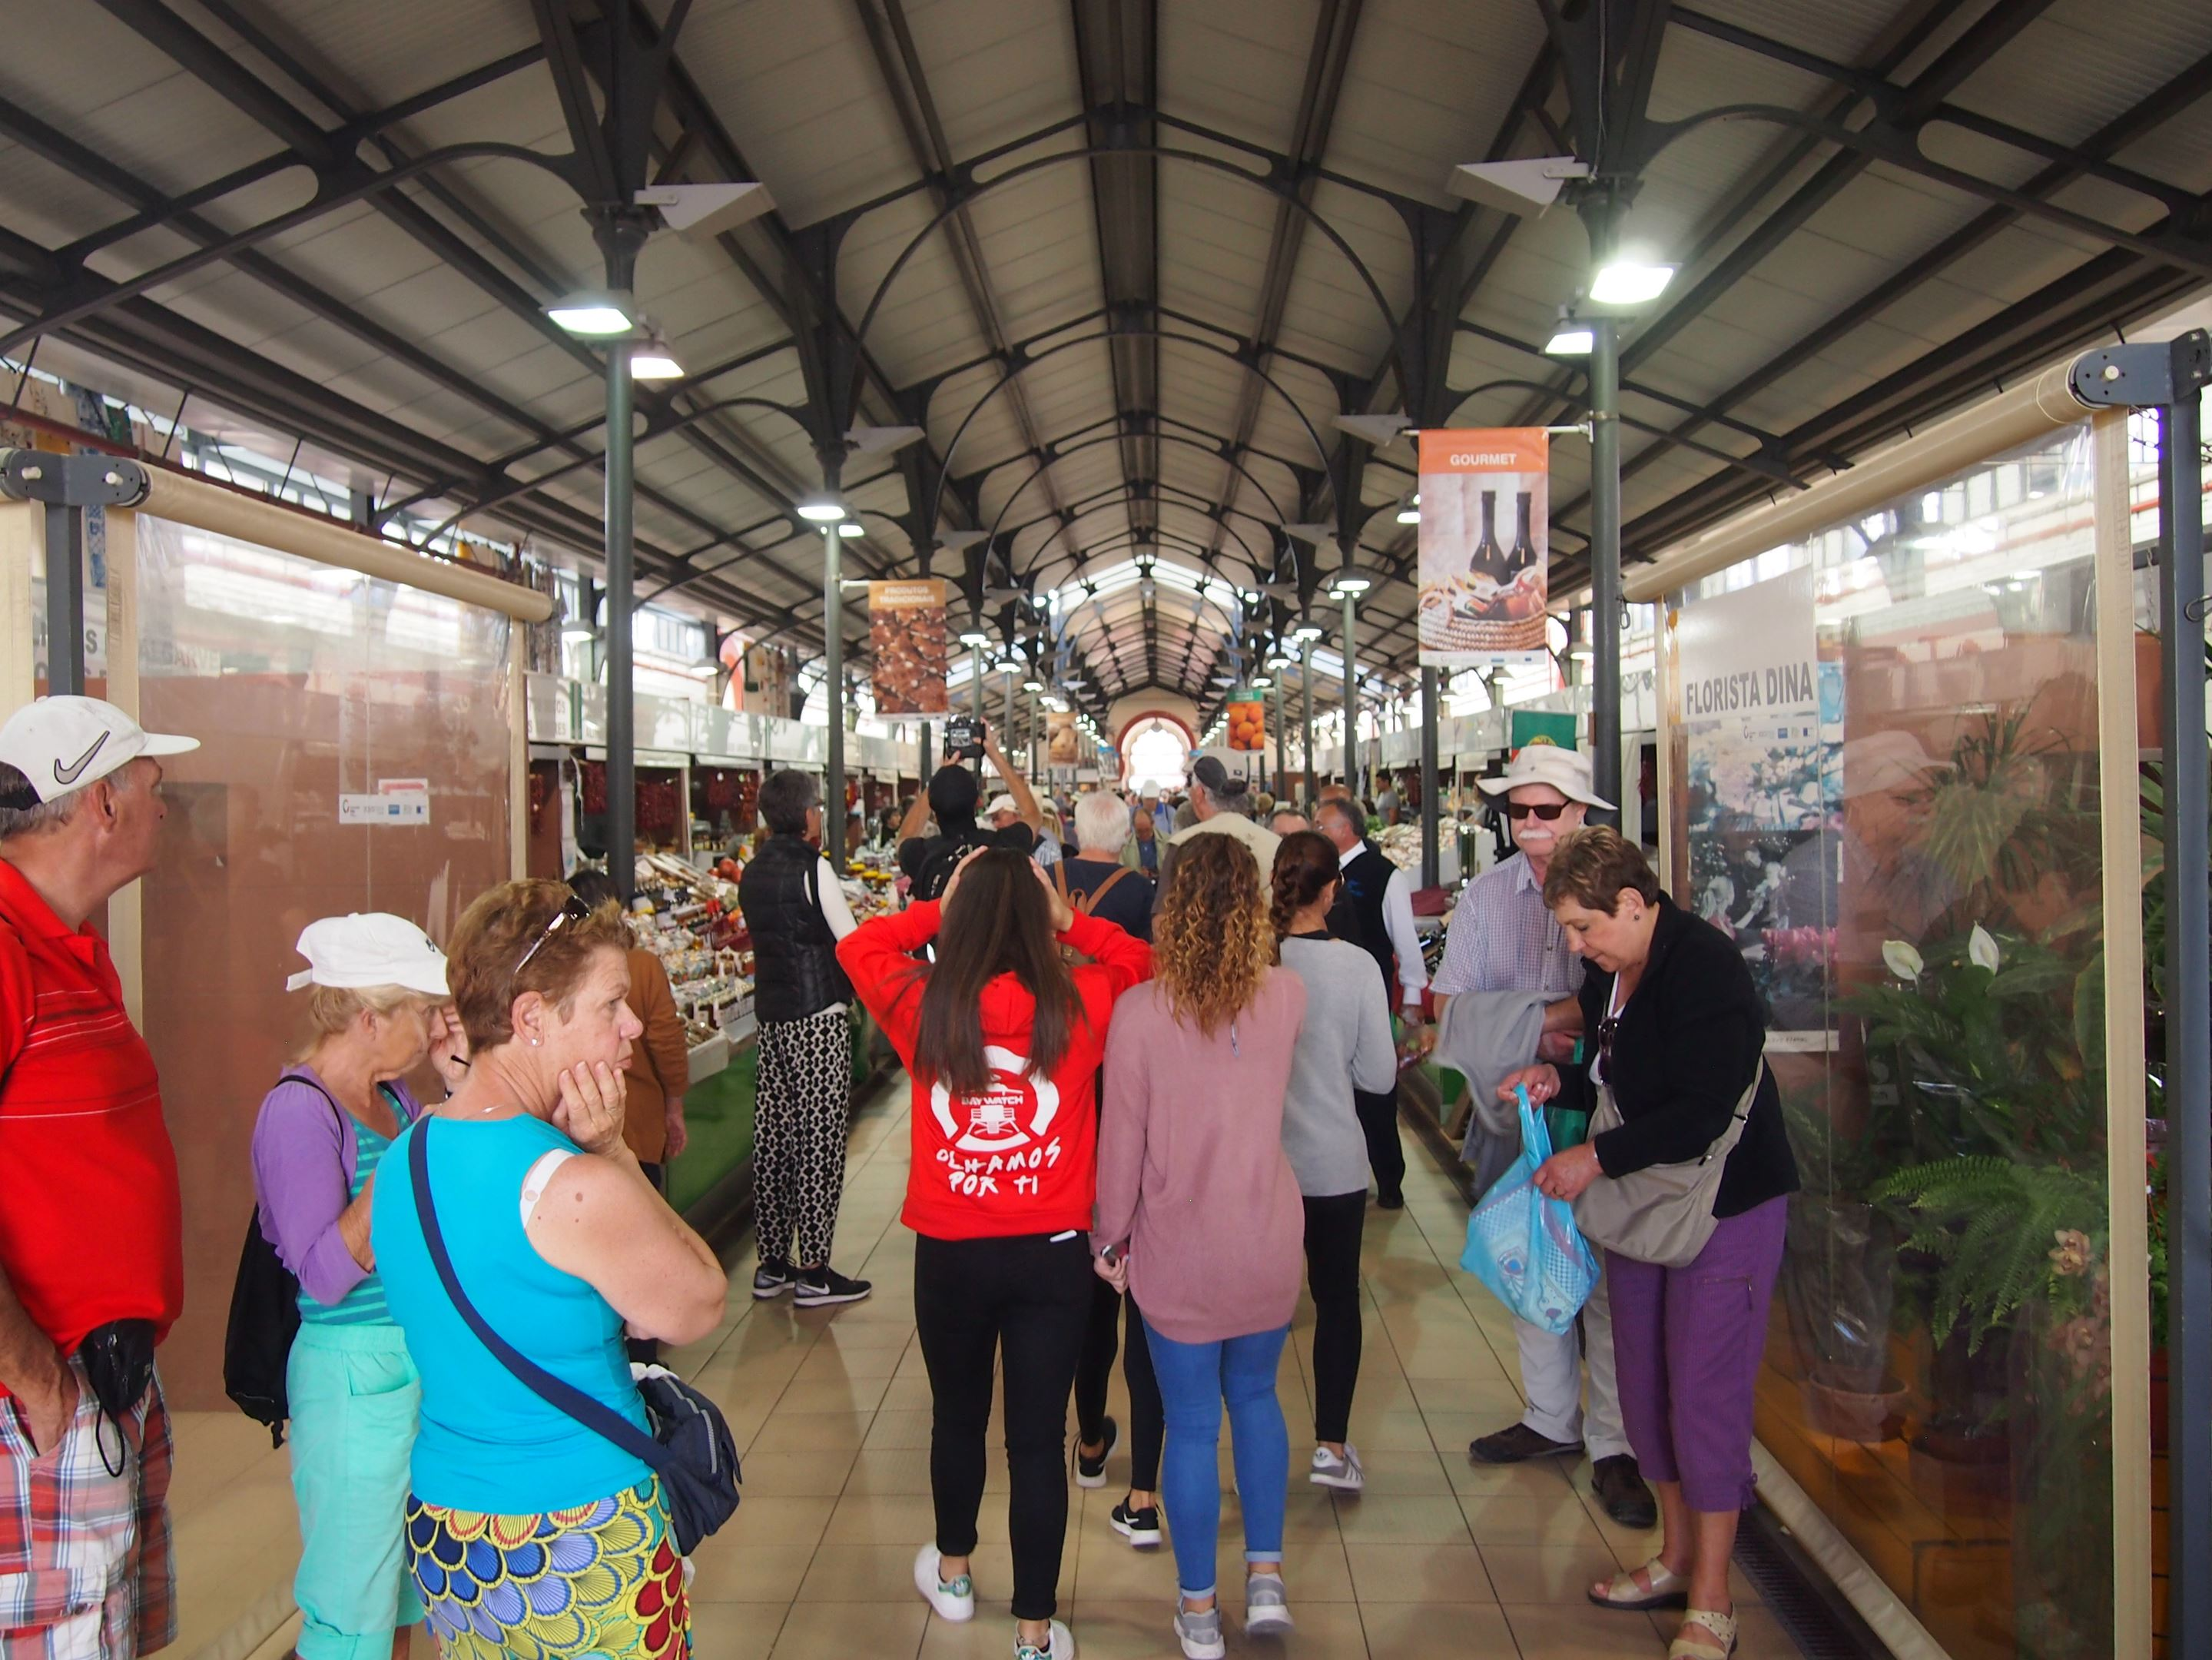 Mercado Municipal de Loulé, Algarve - Interior